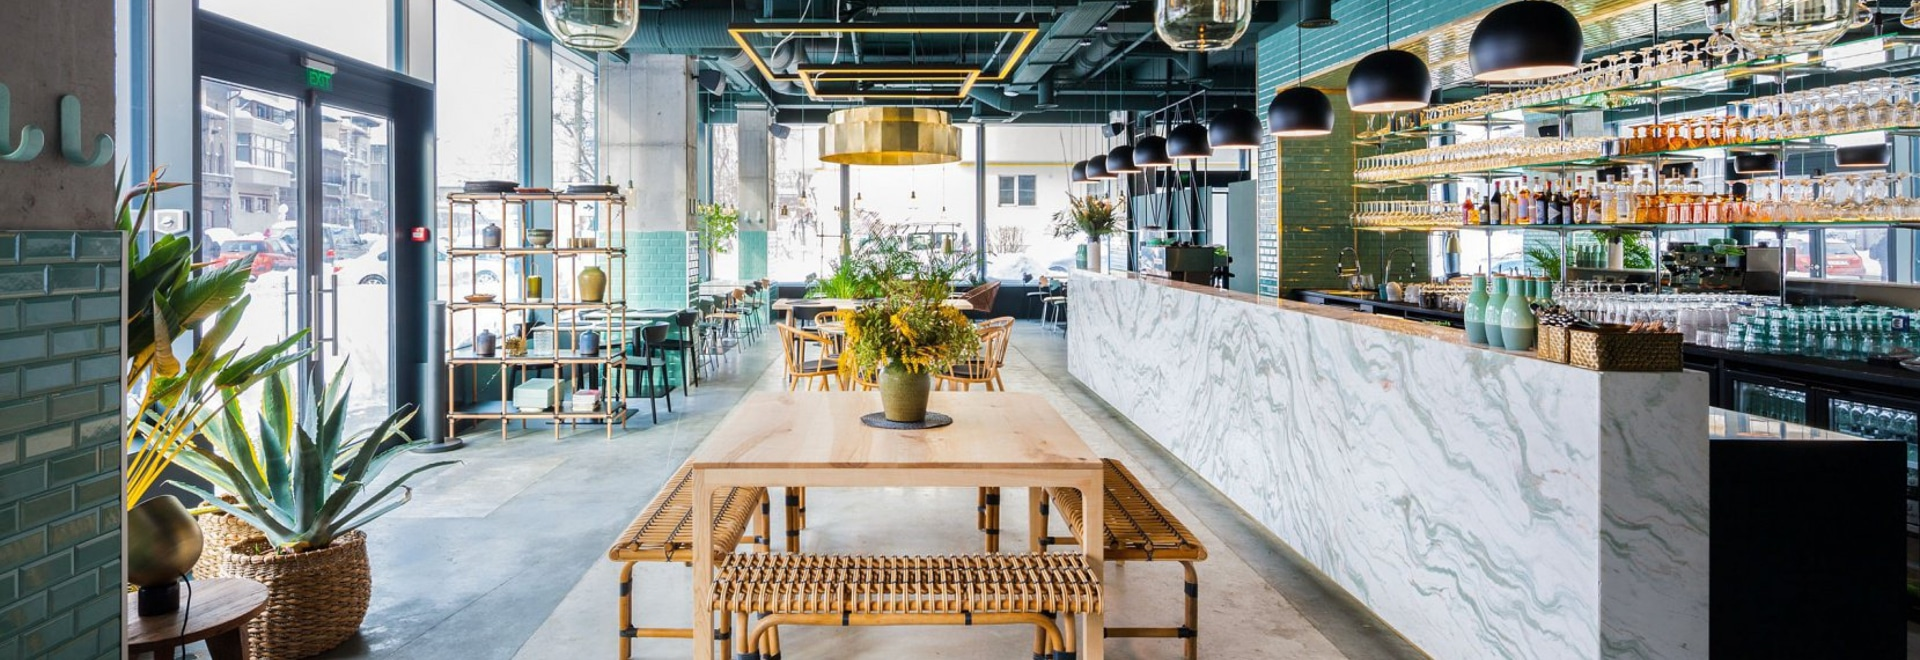 Giungla urbana su un piatto a Kane World Food Studio Restaurant a Bucarest